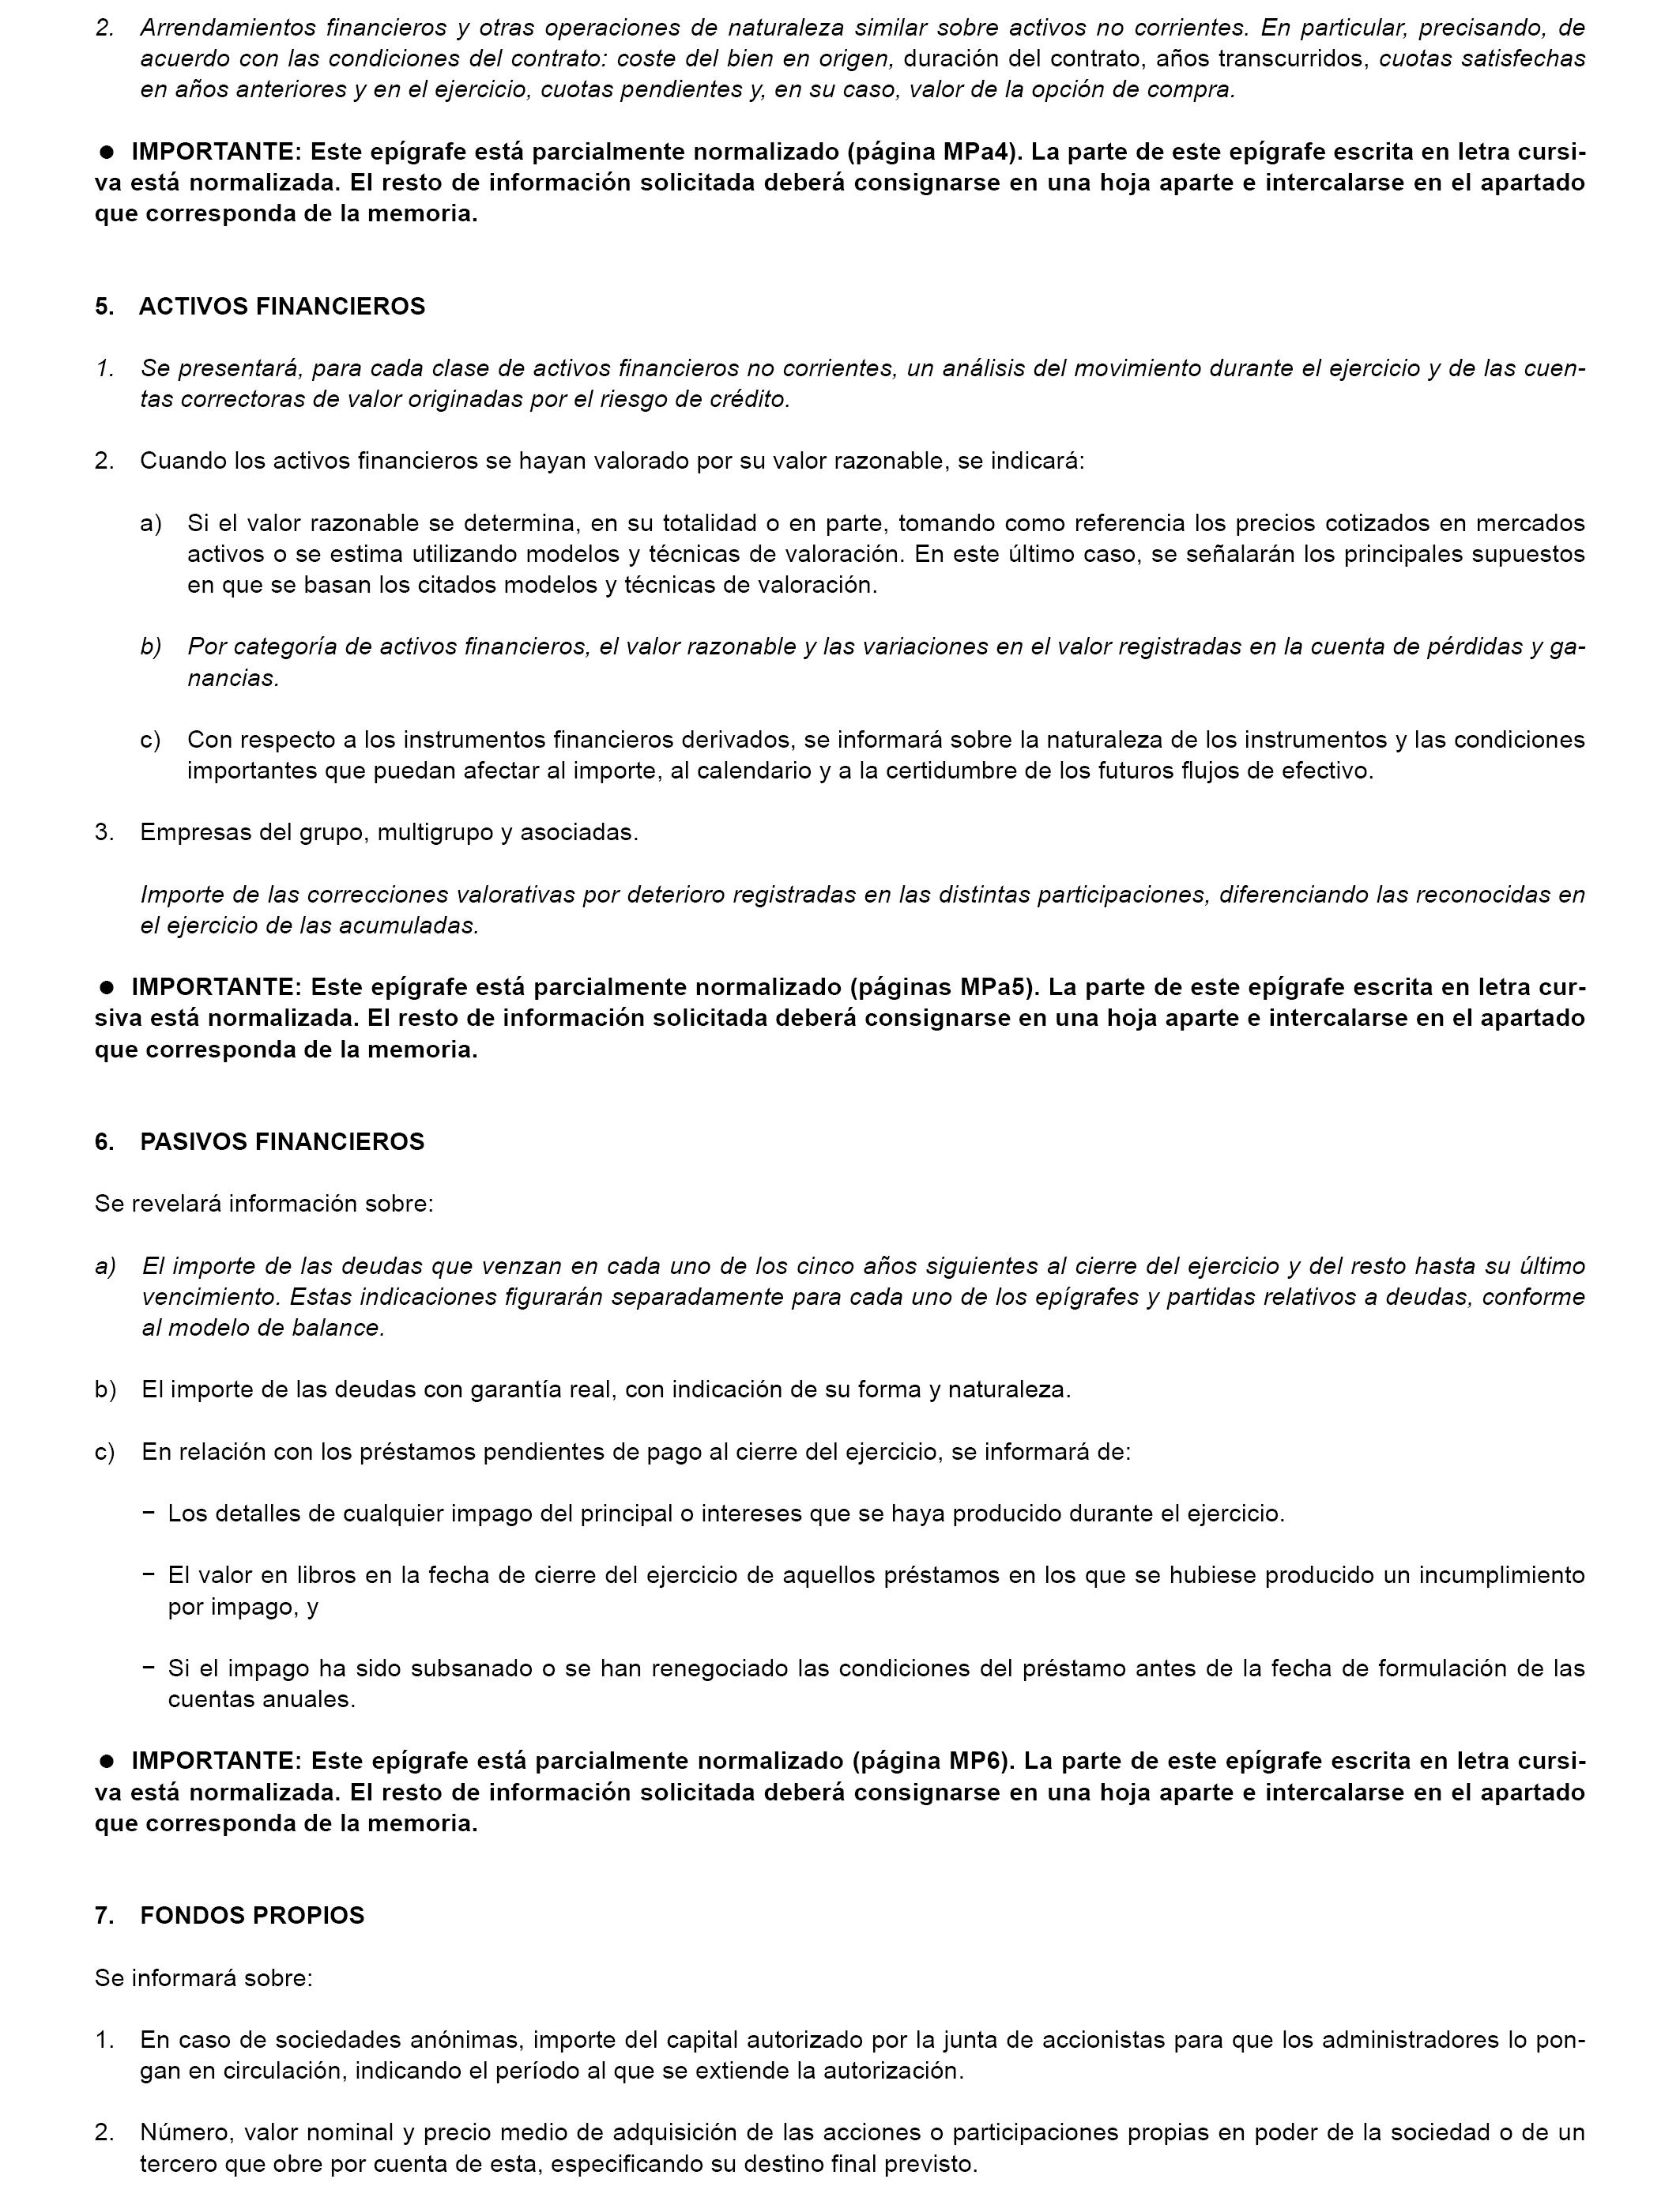 BOE.es - Documento BOE-A-2017-5775